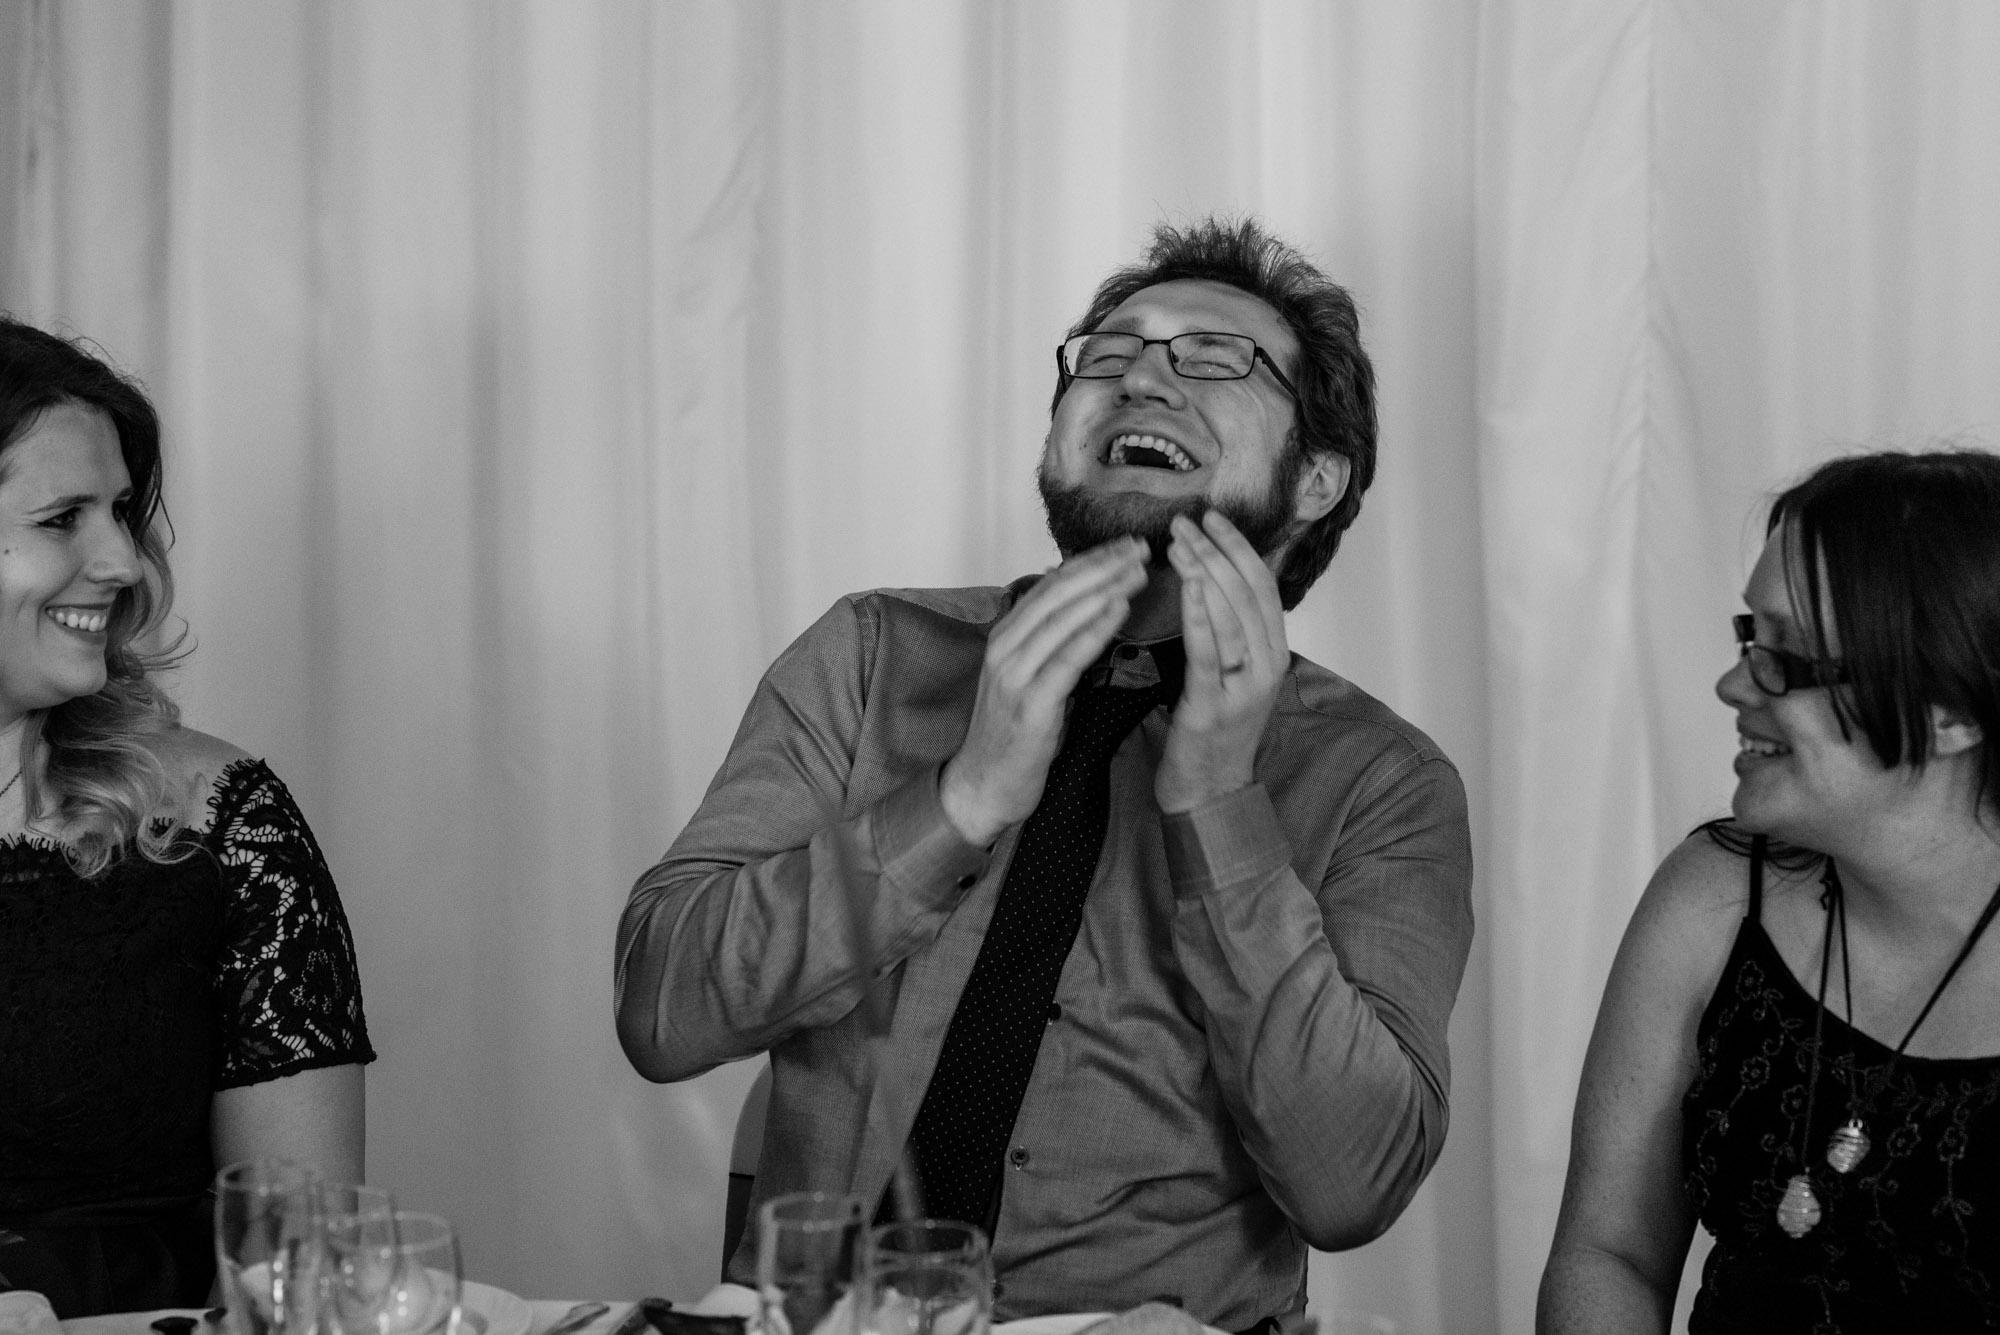 A guest enjoys a belly laugh